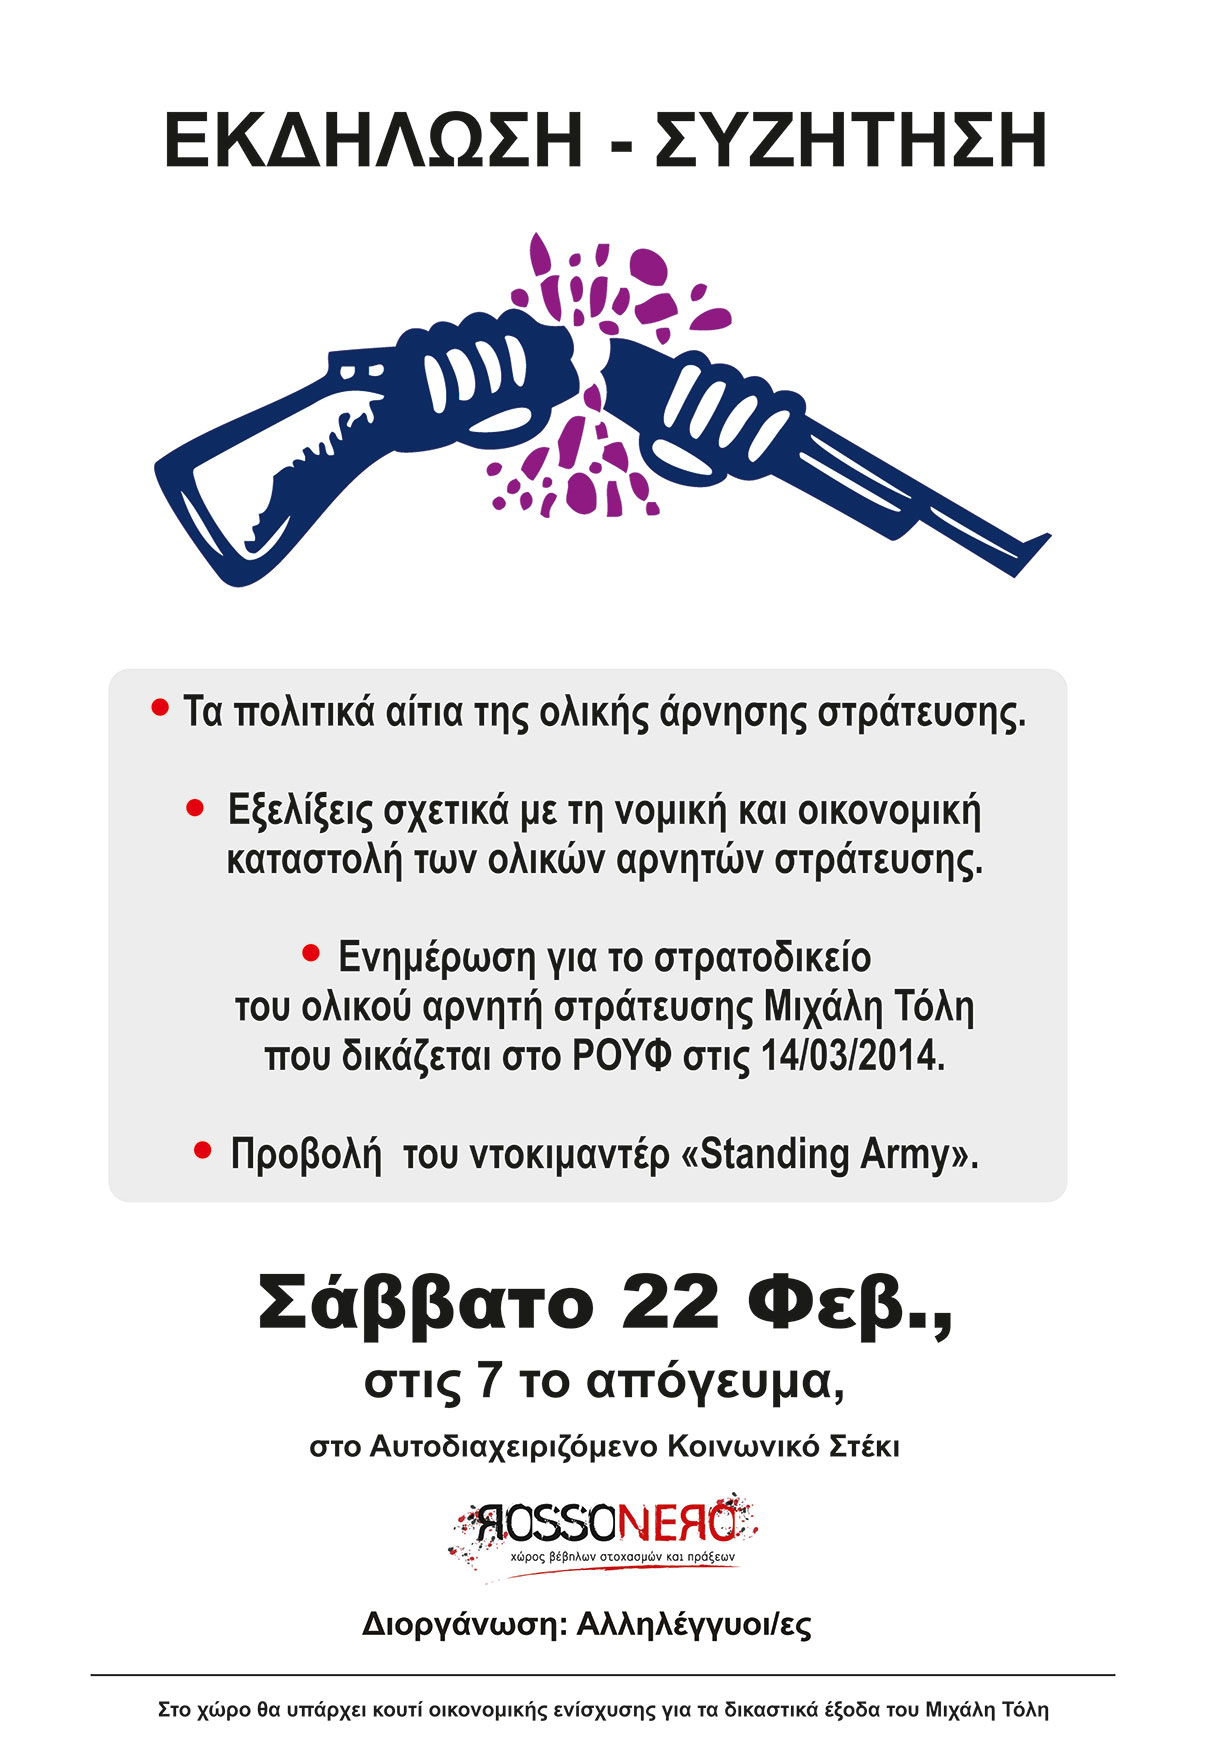 http://xupolutotagma.squat.gr/files/2014/02/220214-ekdhlwsh-trikala.jpg